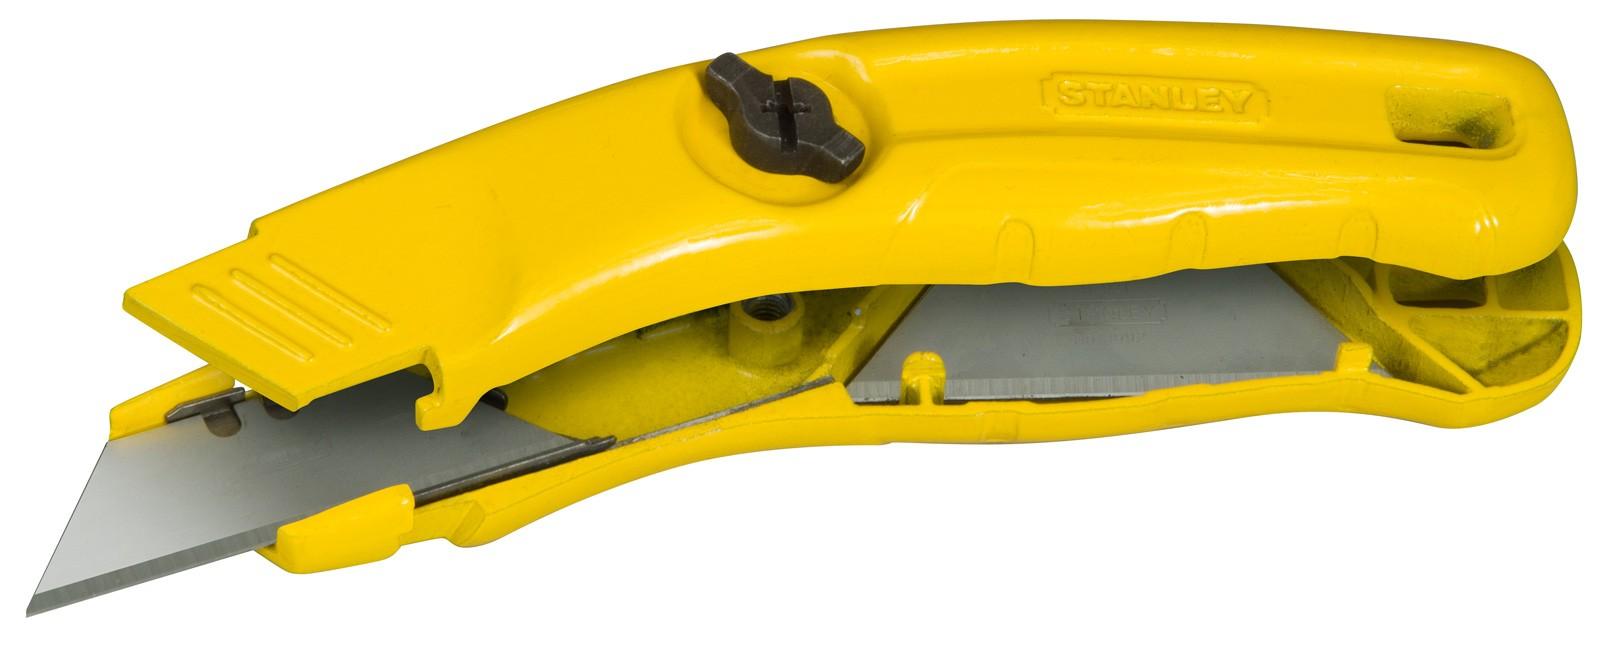 Нож со сменным лезвием трапеция 140мм MPP STANLEY 0-10-705